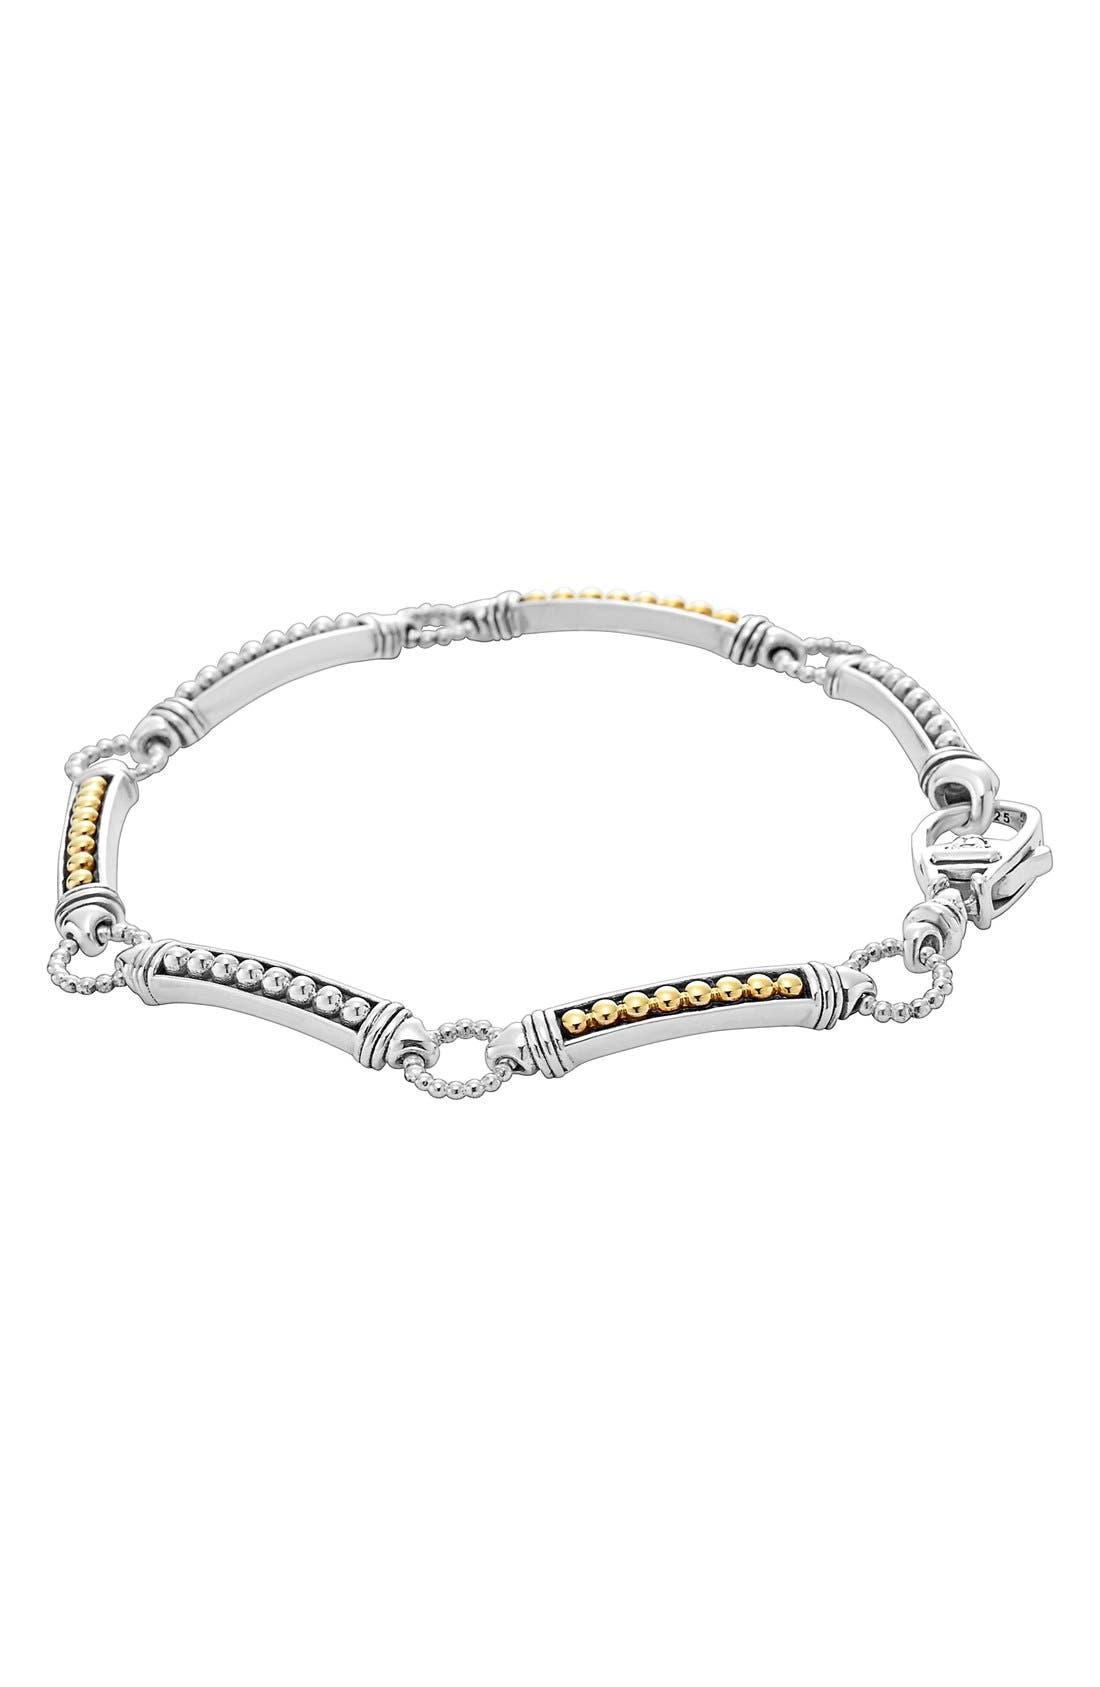 Caviar 'Superfine' Two-Tone Line Bracelet,                             Alternate thumbnail 2, color,                             040